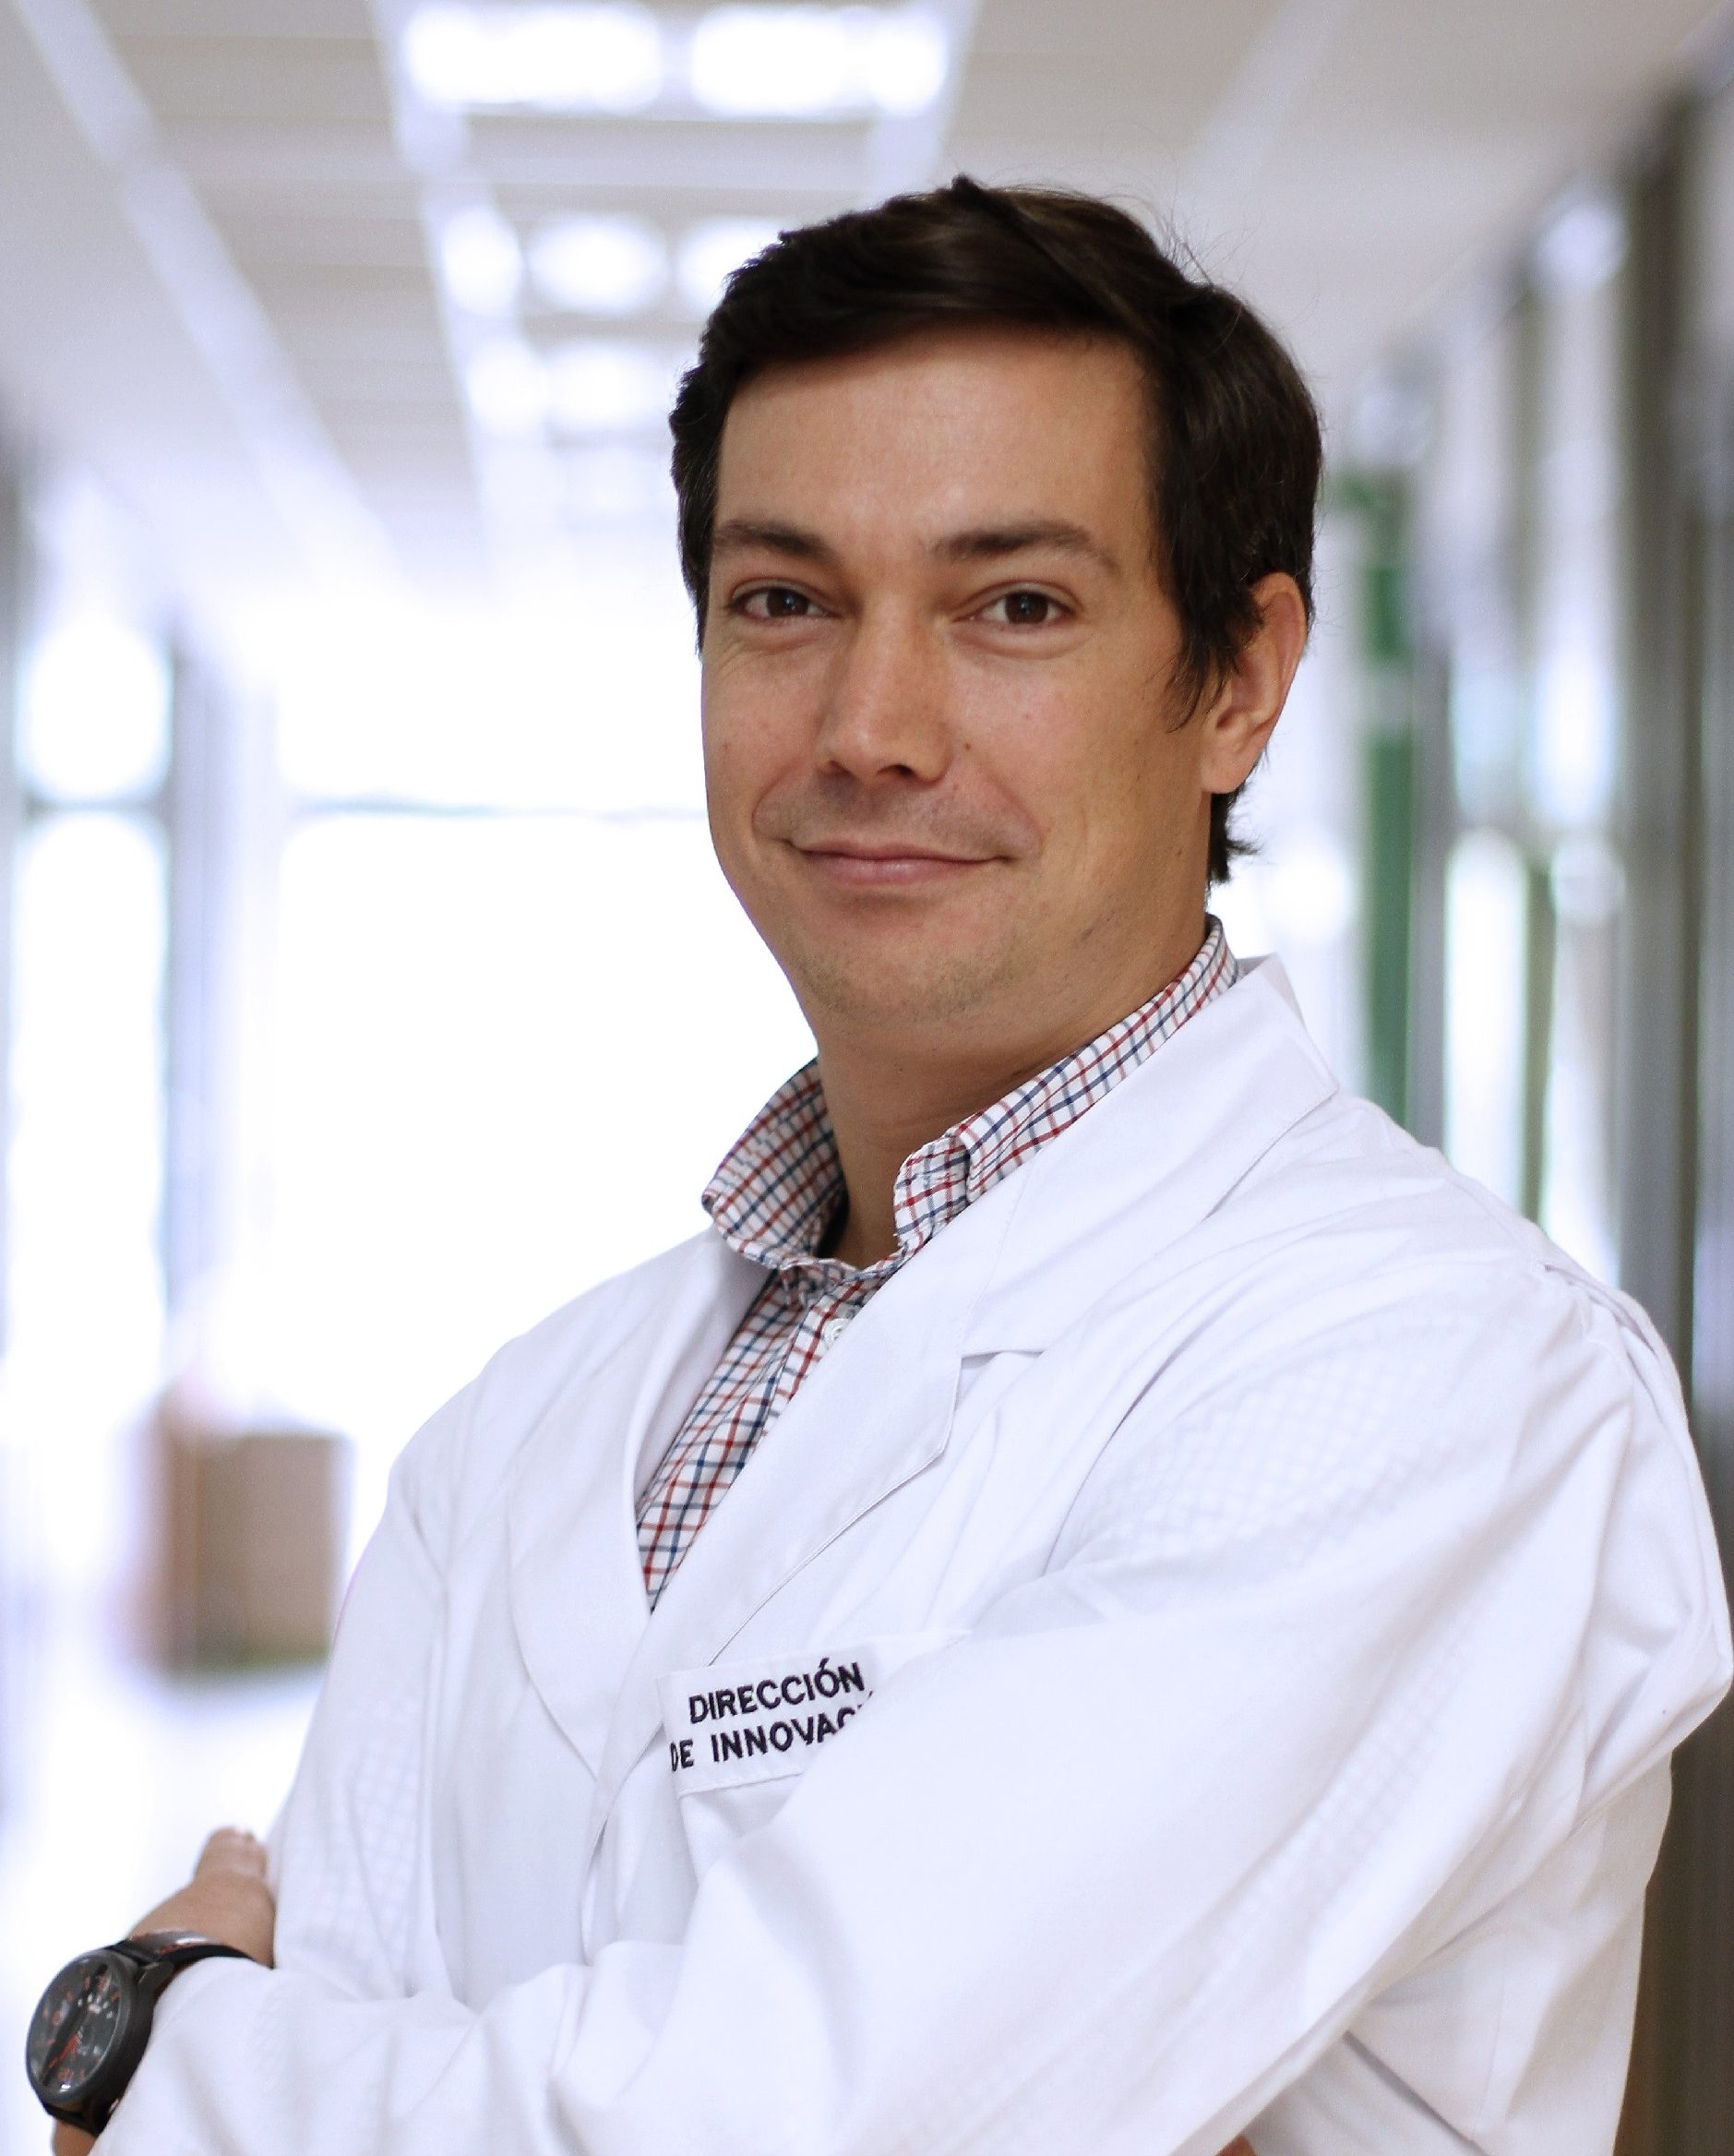 Dr. Juan Pablo Acevedo